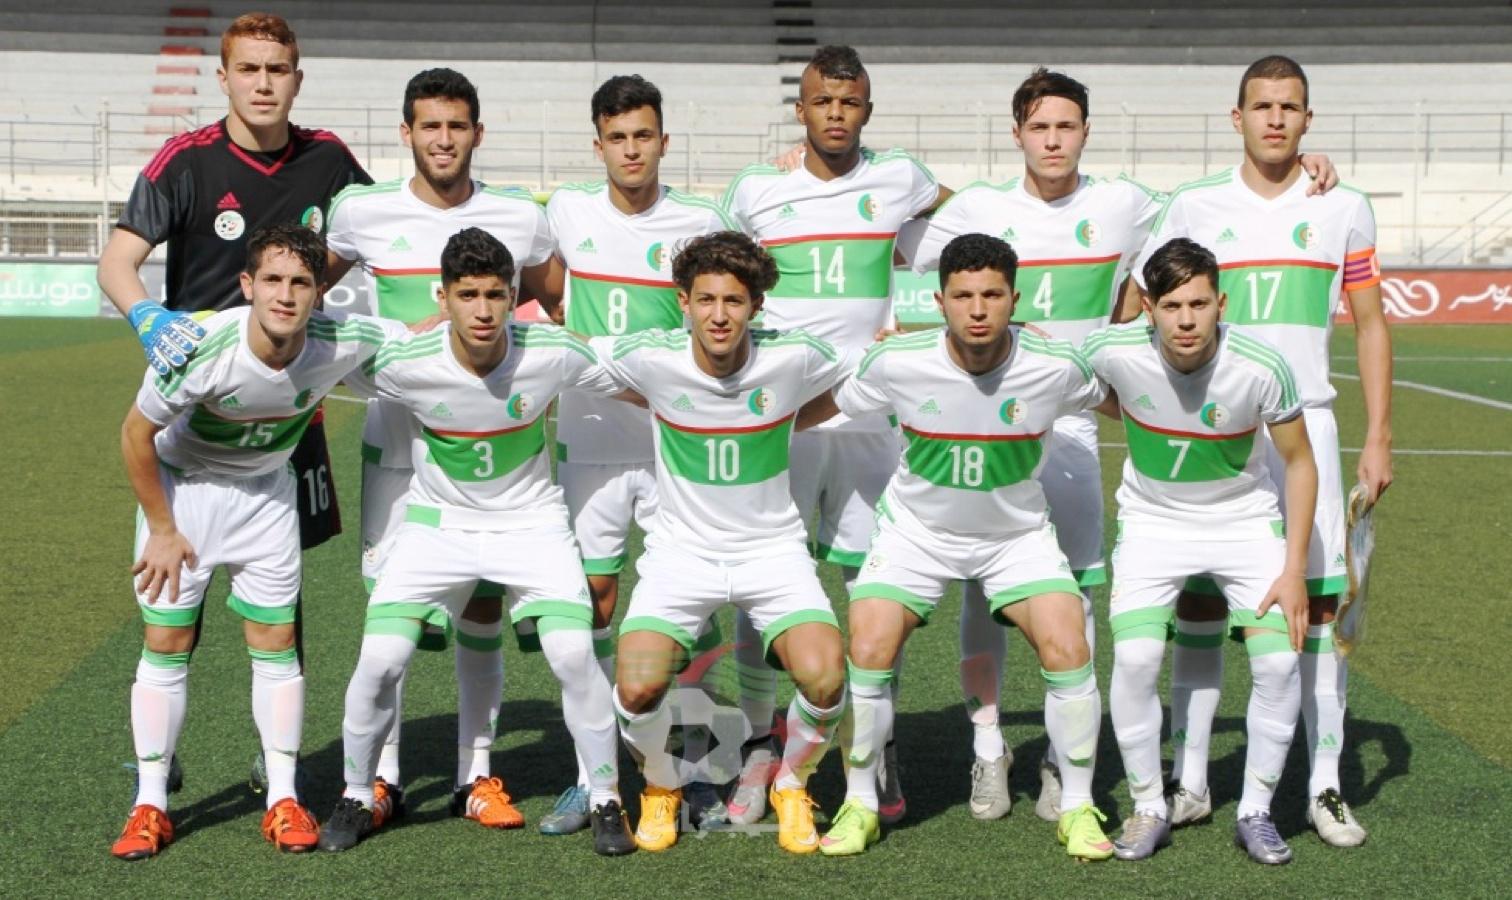 U20 onze type bologhine contre mauritanie